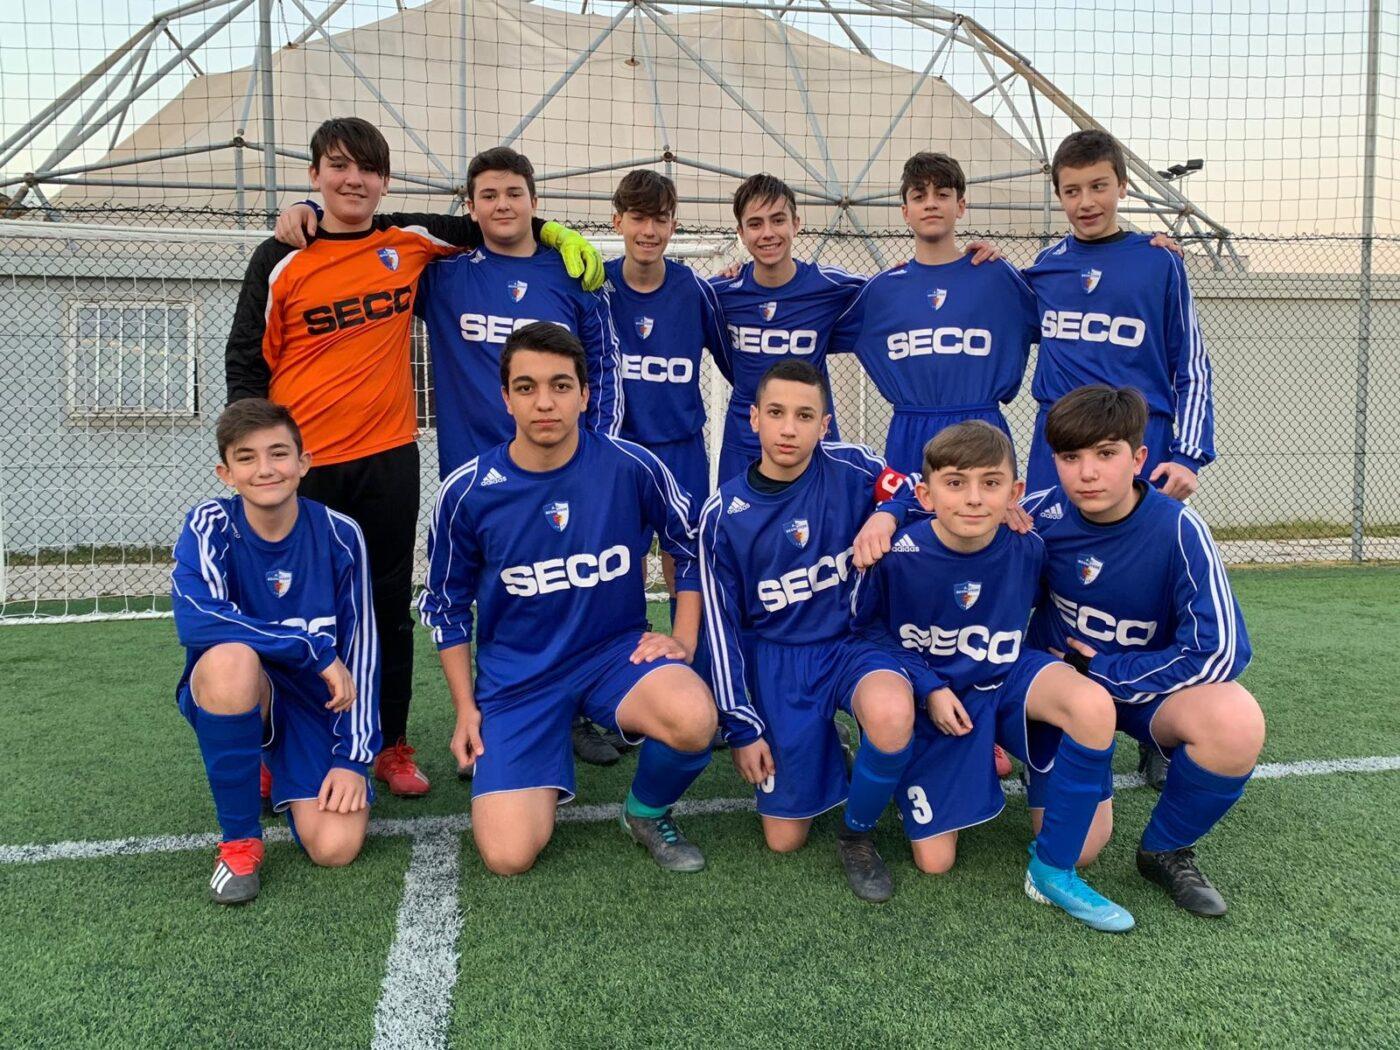 Accademia Varesina Besnatese Under 15 Besnatese